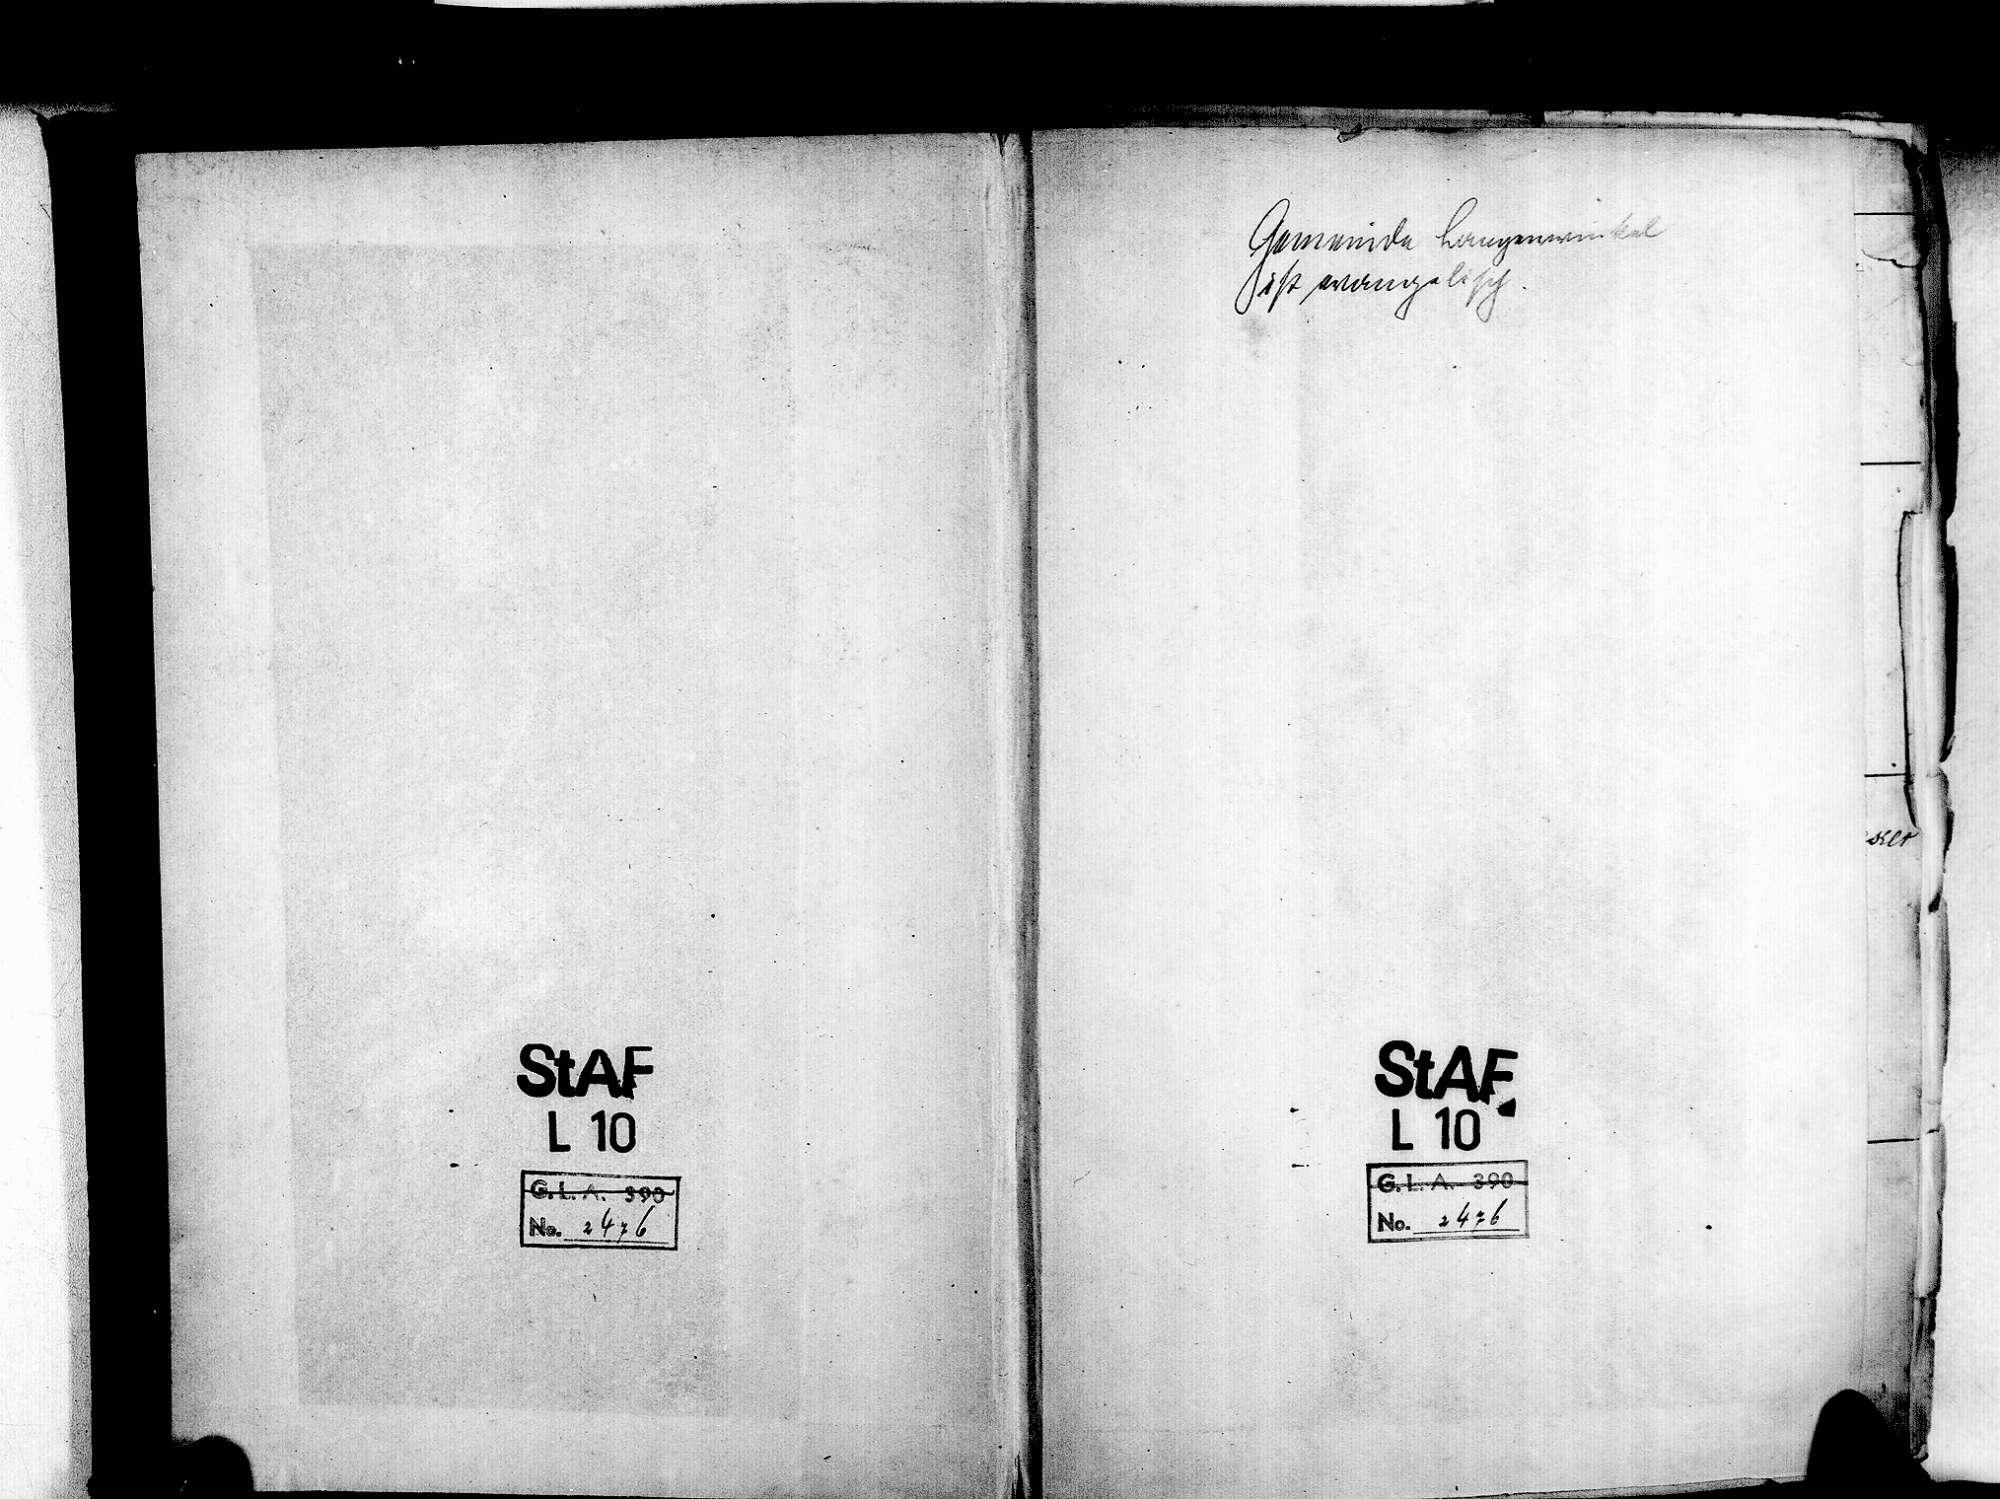 Langenwinkel, Lahr im Schwarzwald OG; Evangelische Gemeinde: Standesbuch 1804-1869 Langenwinkel, Lahr im Schwarzwald OG; Katholische Gemeinde: Standesbuch 1804-1869, Bild 2